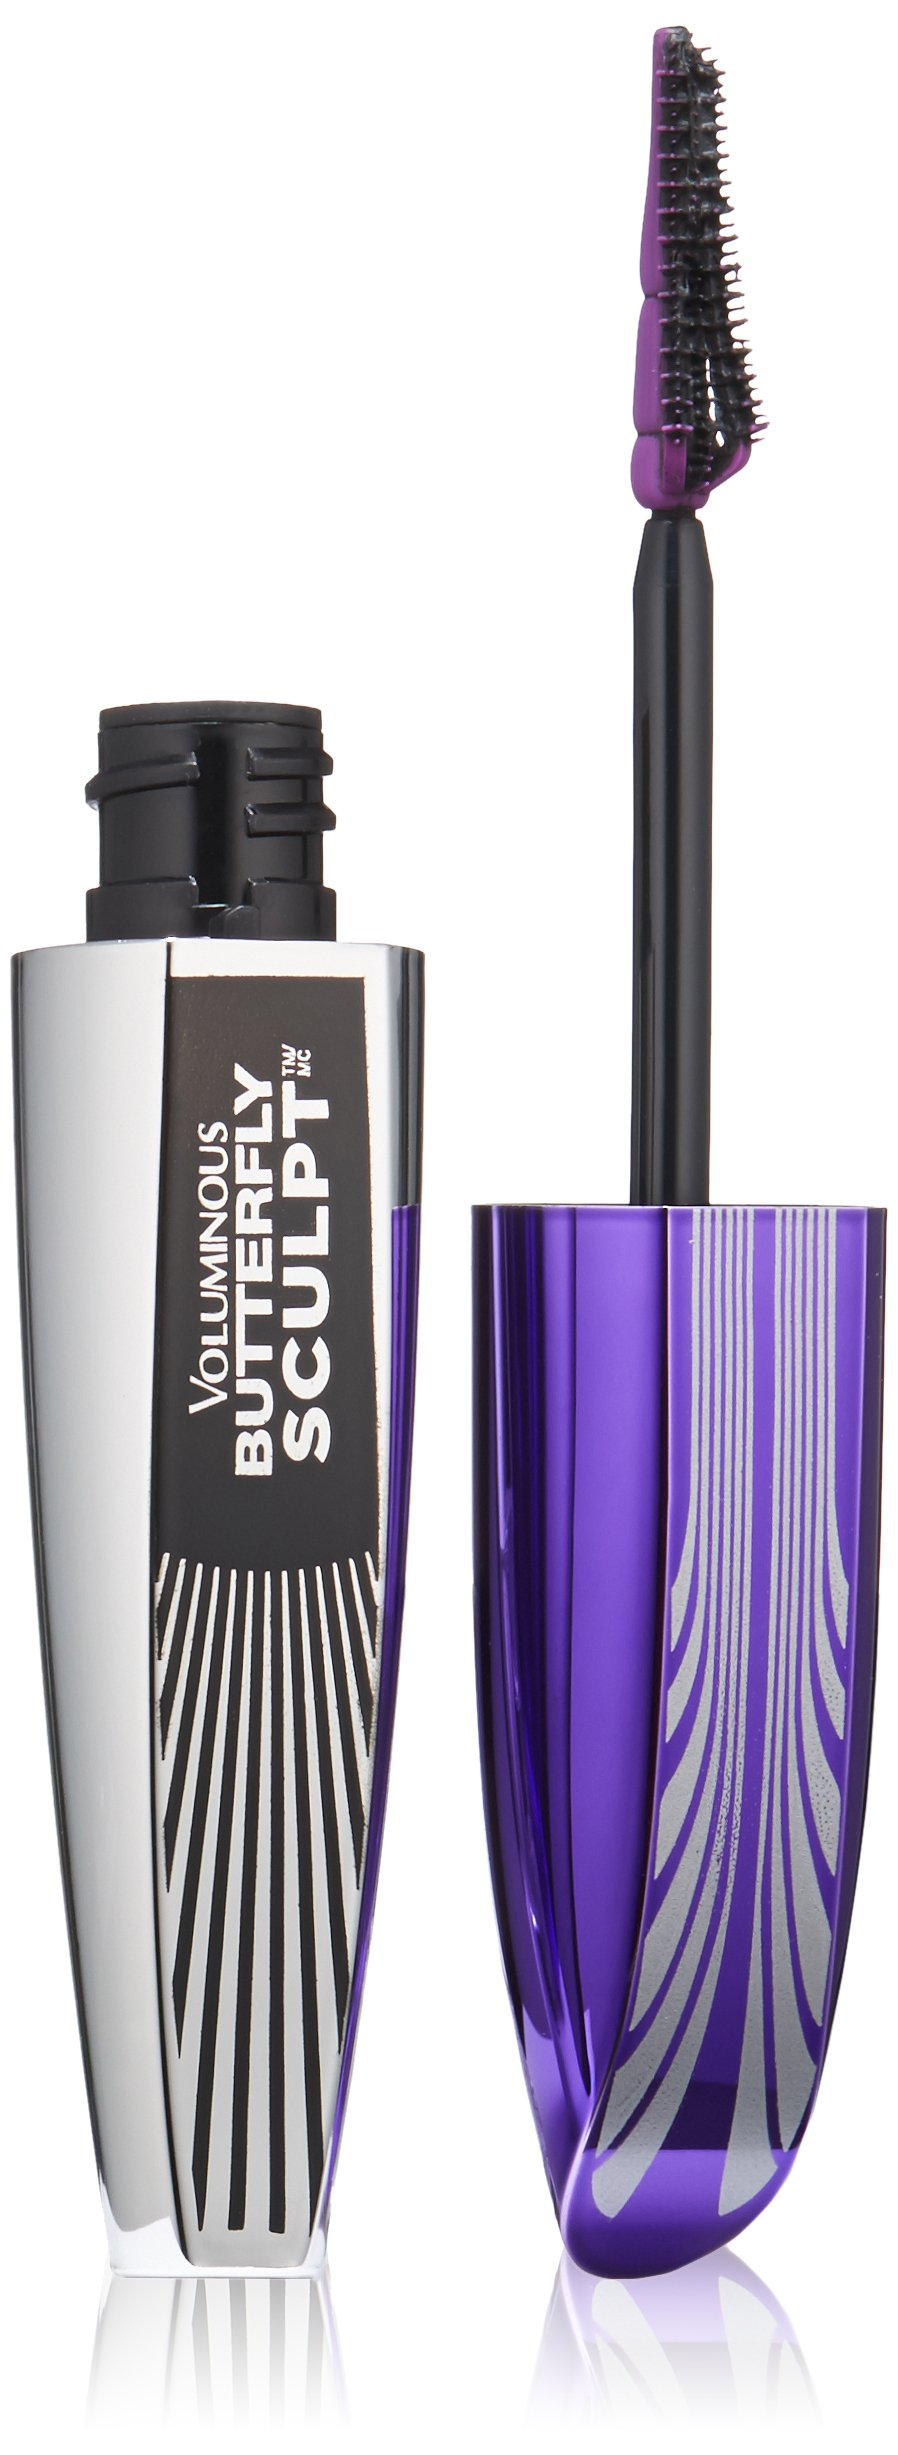 L'Oreal Paris - L'Oreal Paris Cosmetics Voluminous Butterfly Sculpt Washable Mascara, Black, 0.27 Fluid Ounce